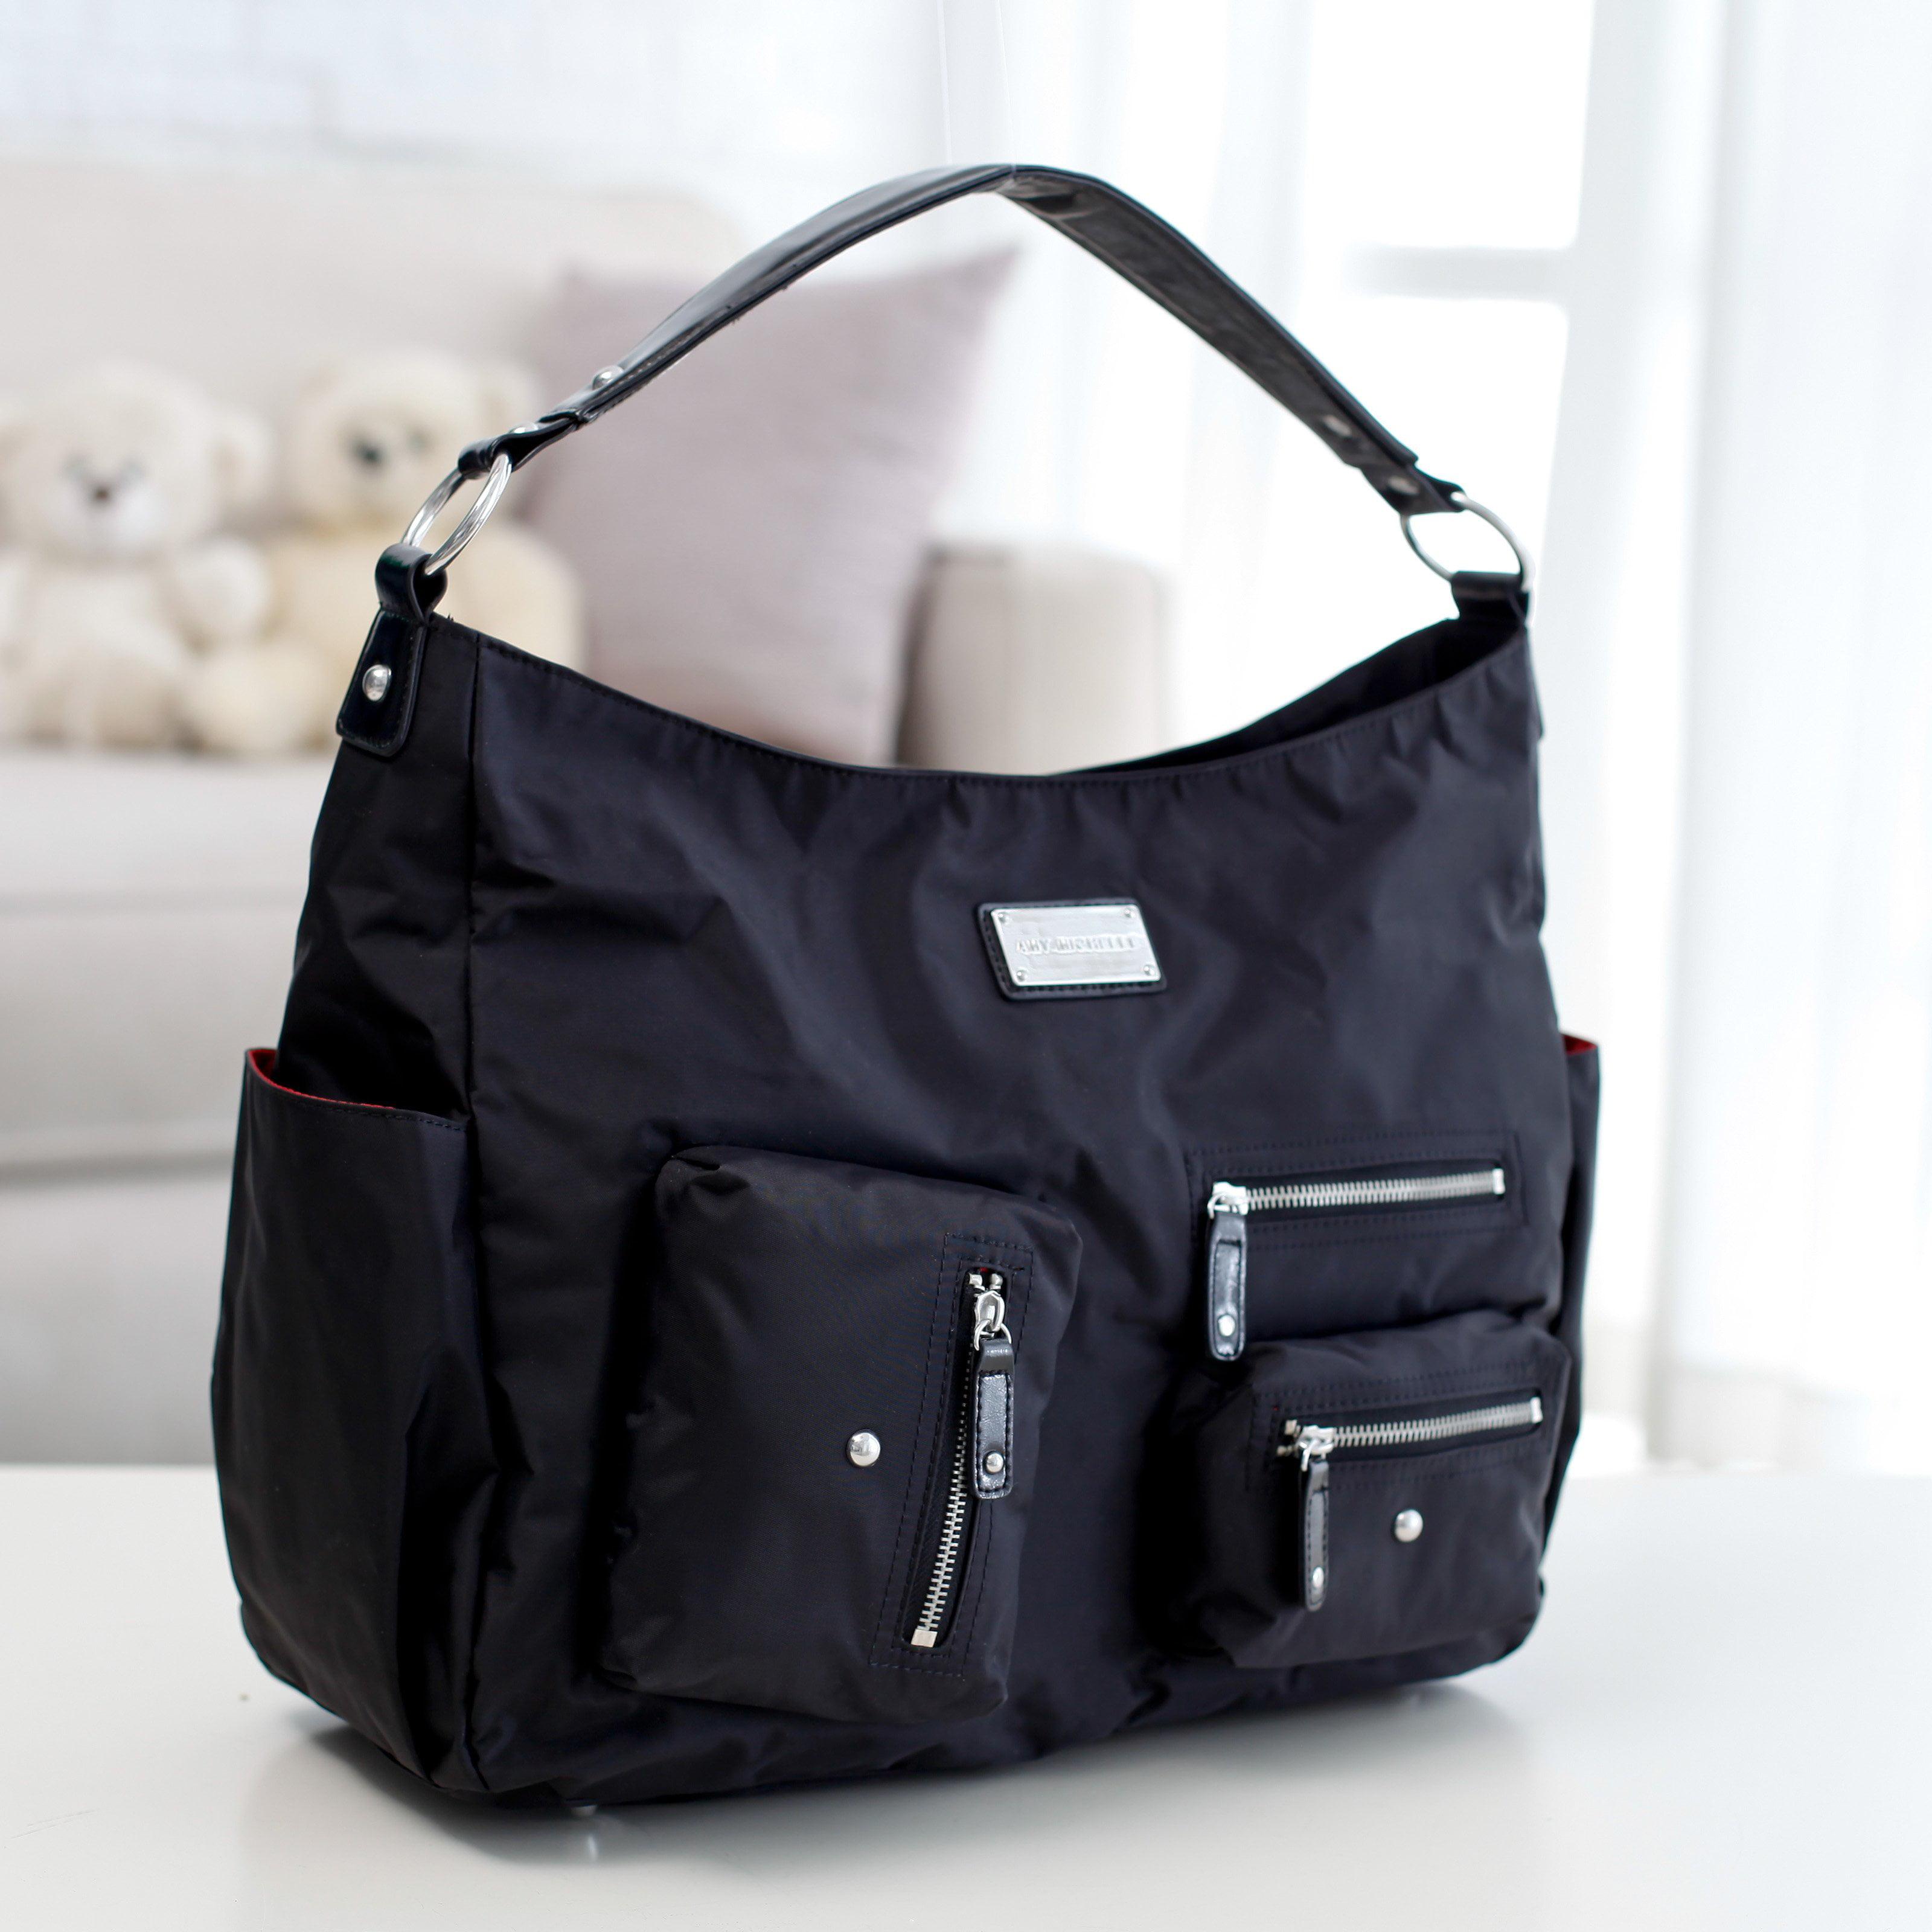 Amy Michelle Lotus Go Bebe Diaper Bag - Black